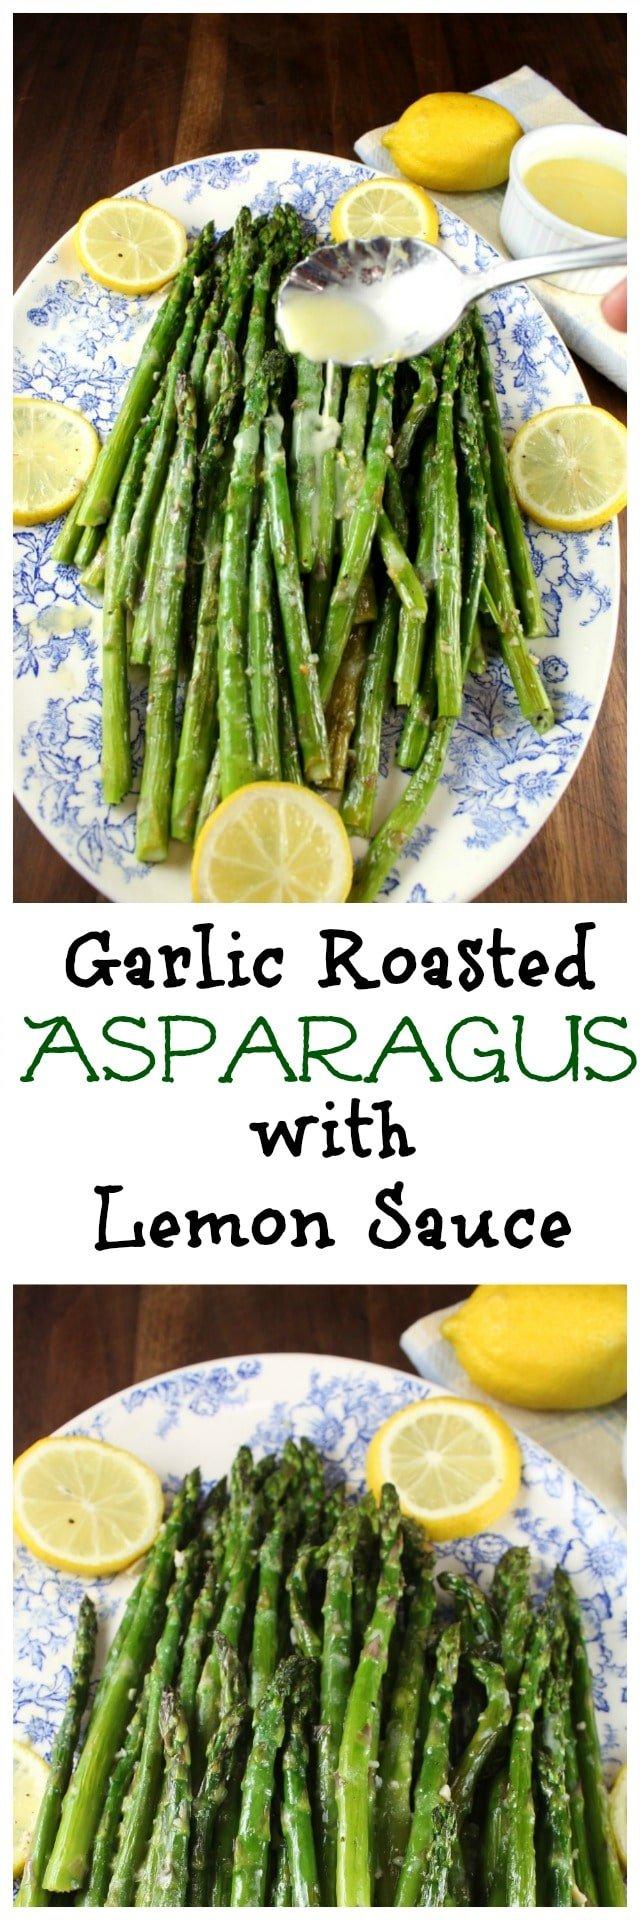 Garlic Roasted Asparagus with Lemon Sauce Recipe from MissintheKitchen.com